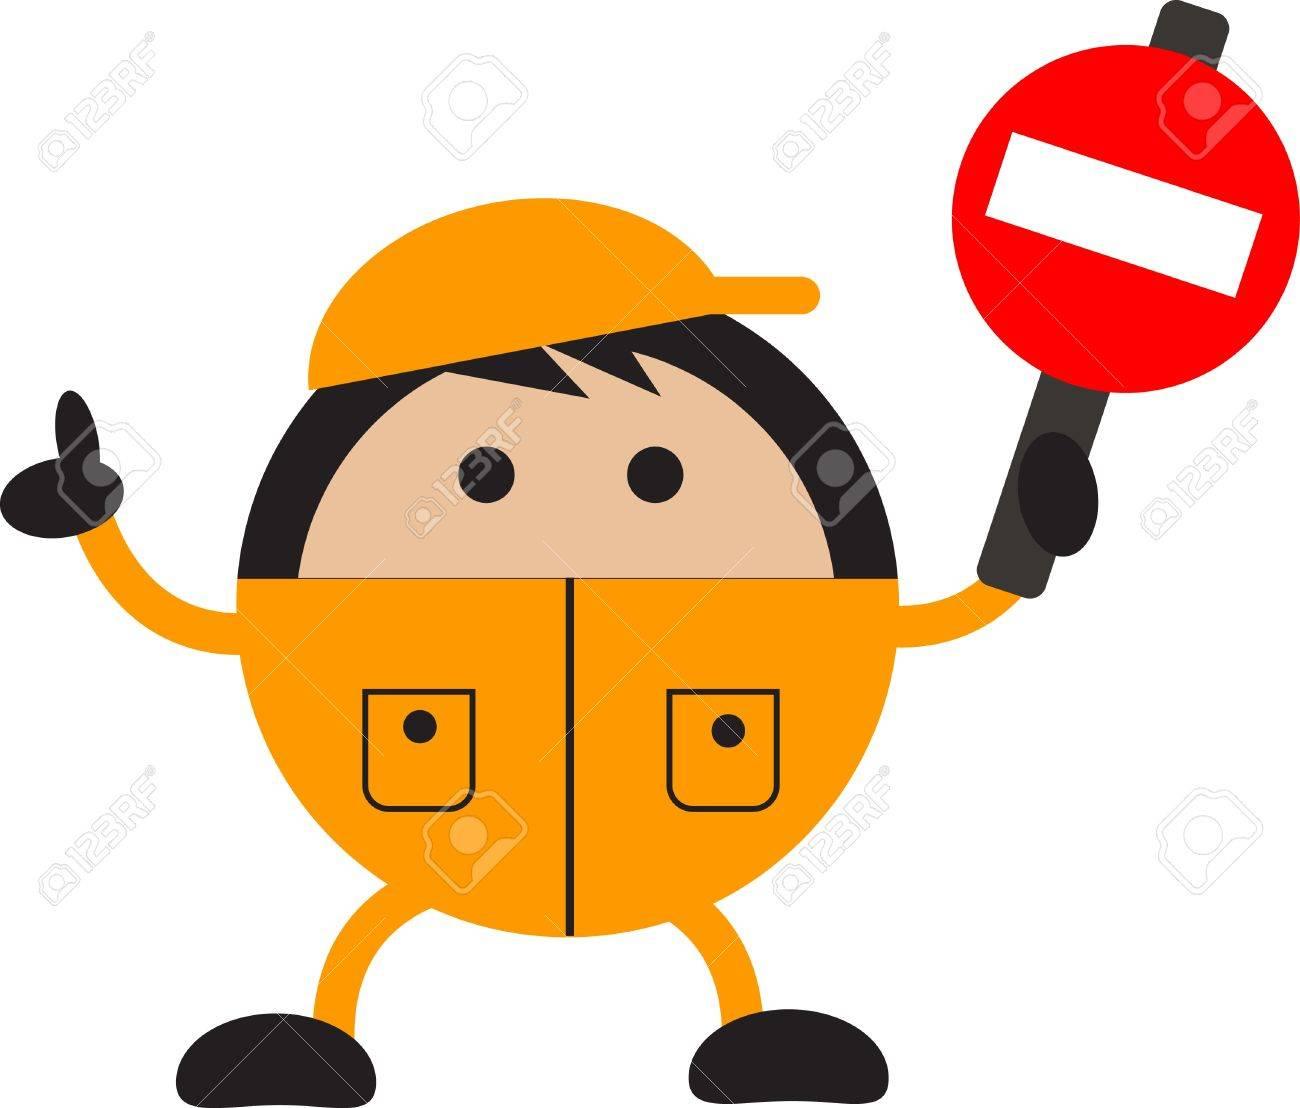 traffic sign Stock Vector - 12489916